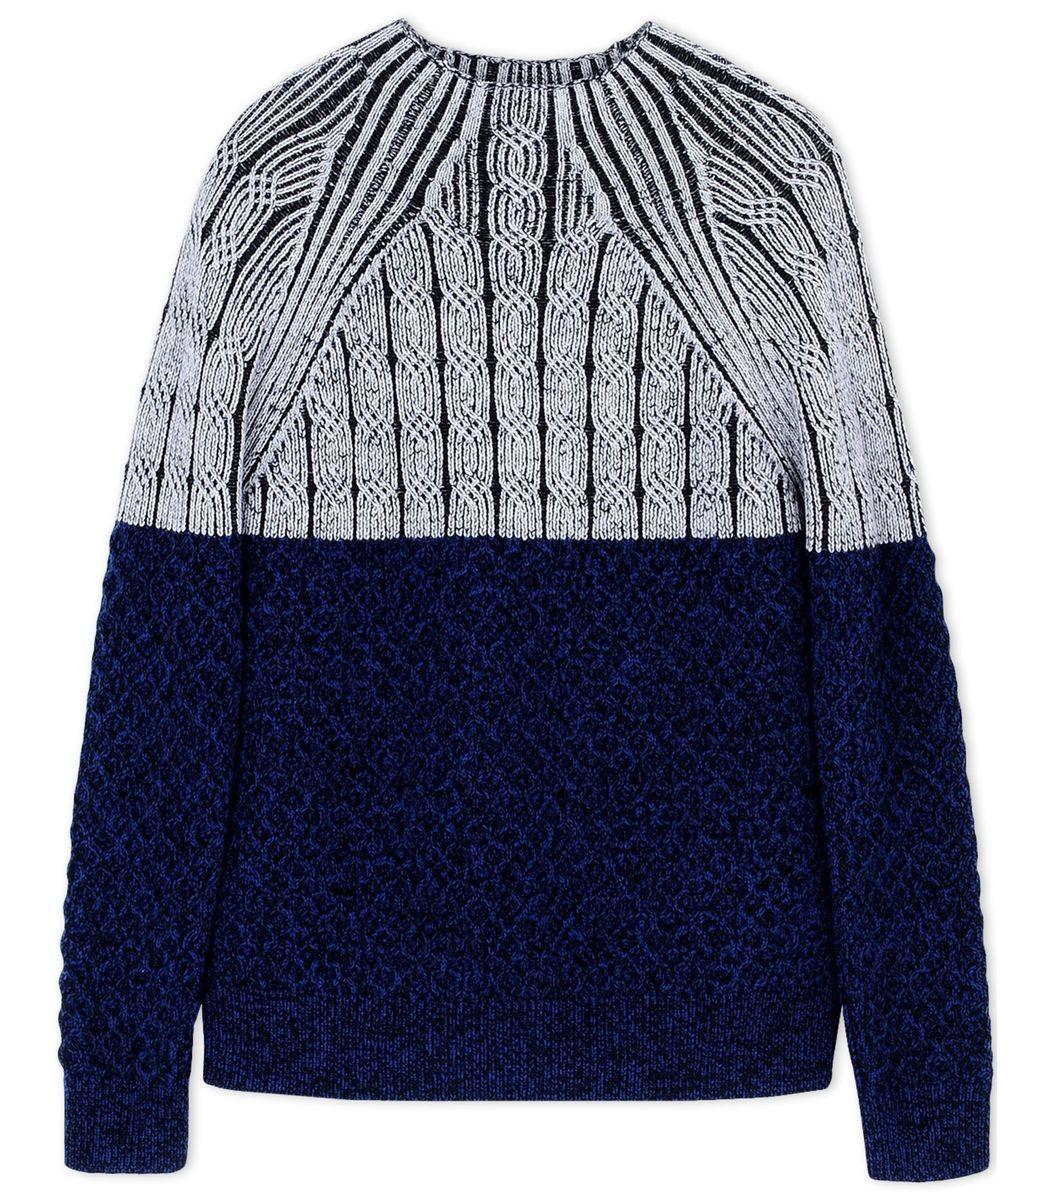 Proenza Schouler Navy Color-Block Wool Turtleneck Sweater | Stitch ...